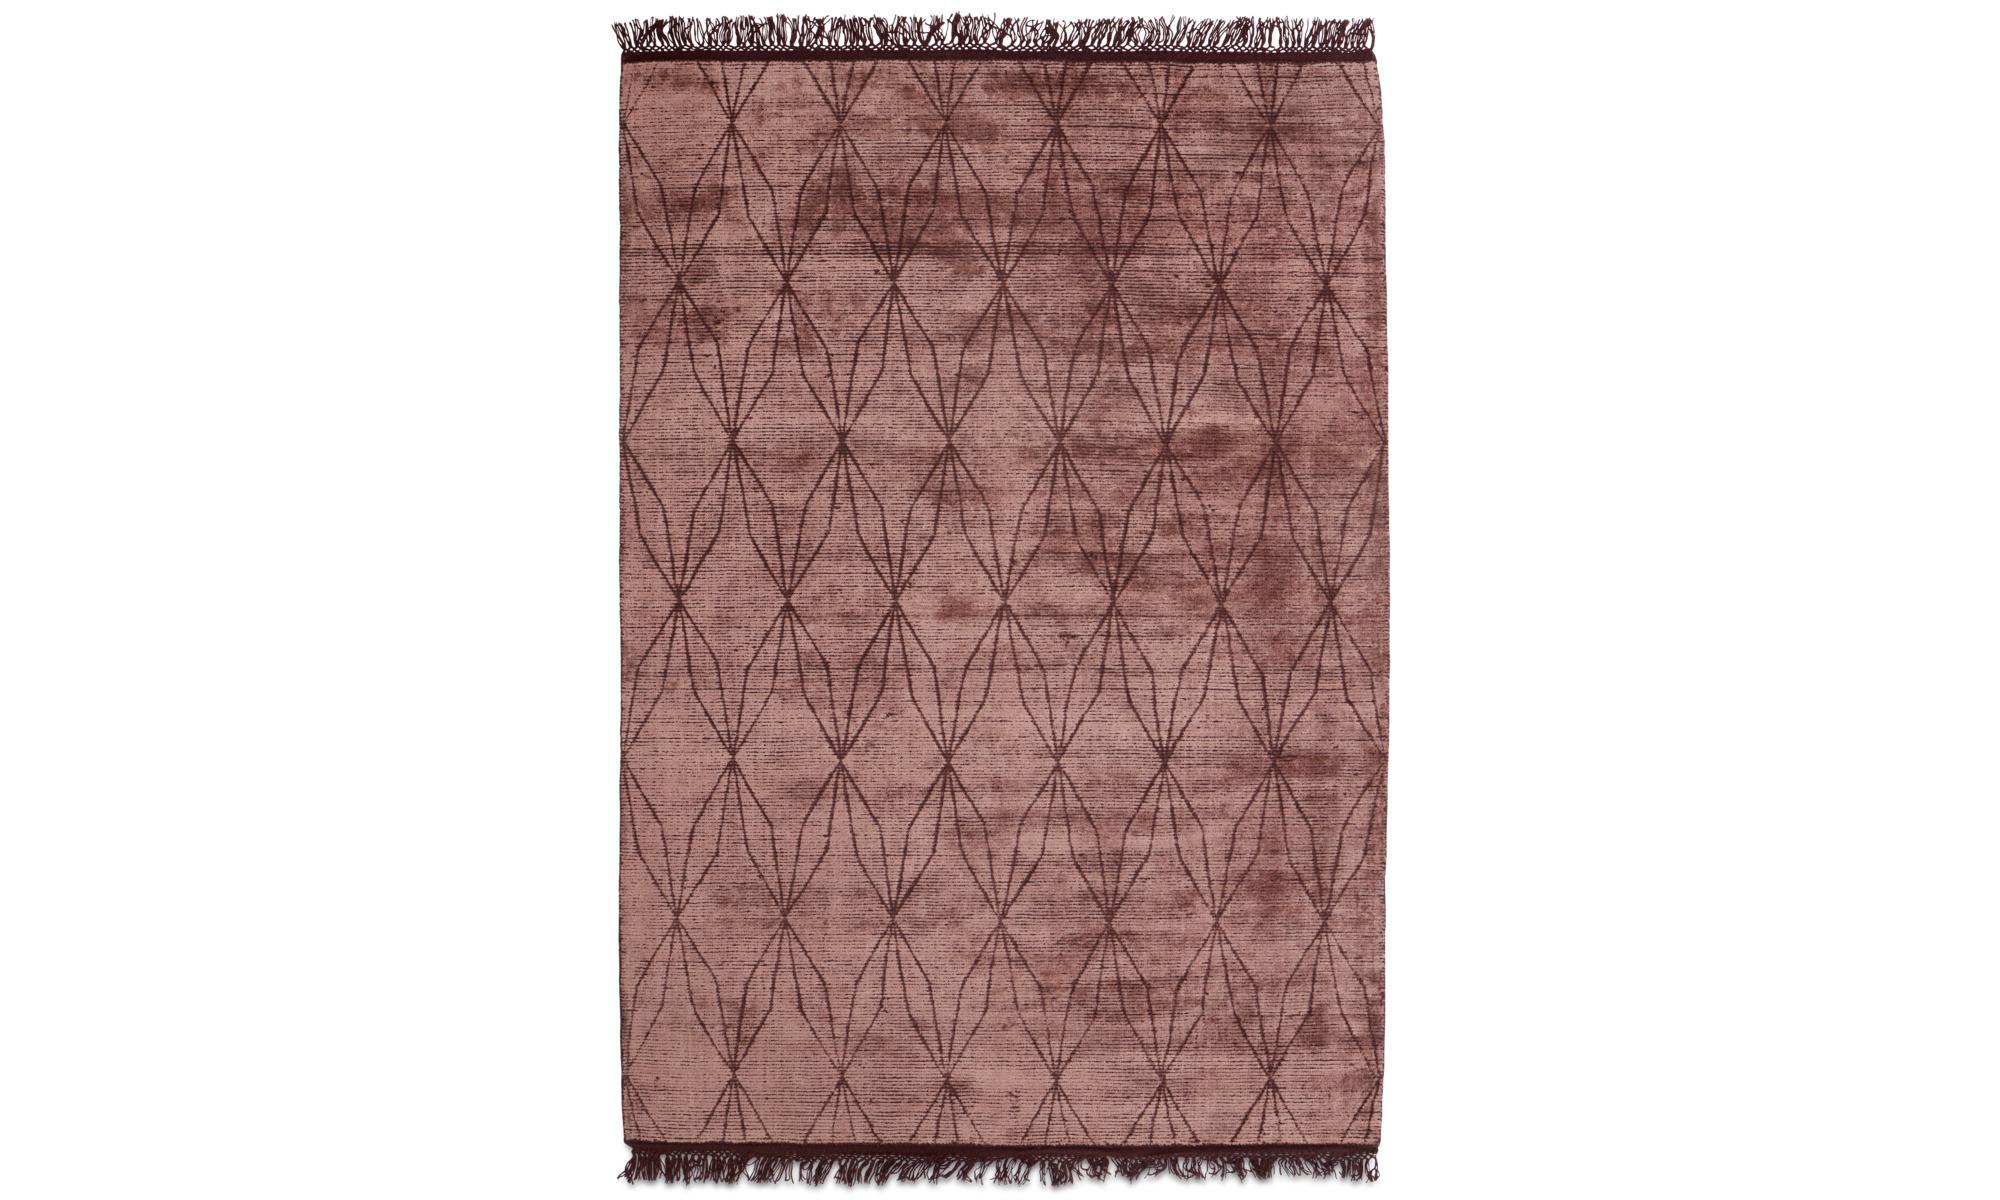 Teppiche - Depiction Teppich - rechteckig - Rot - Wolle